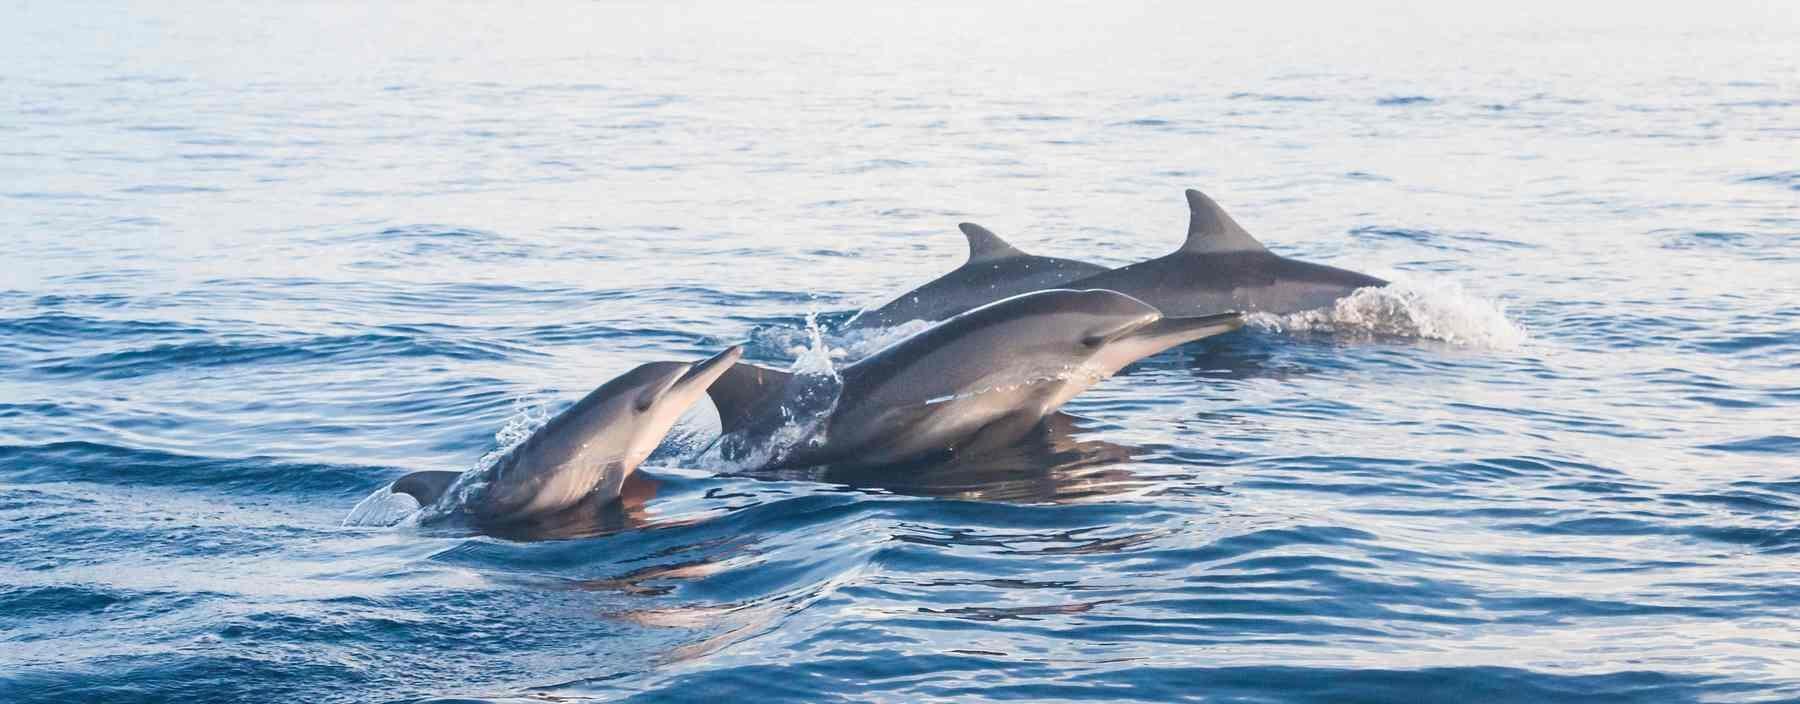 id, bali, lovina, dolphins jumping lovina beach (3).jpg